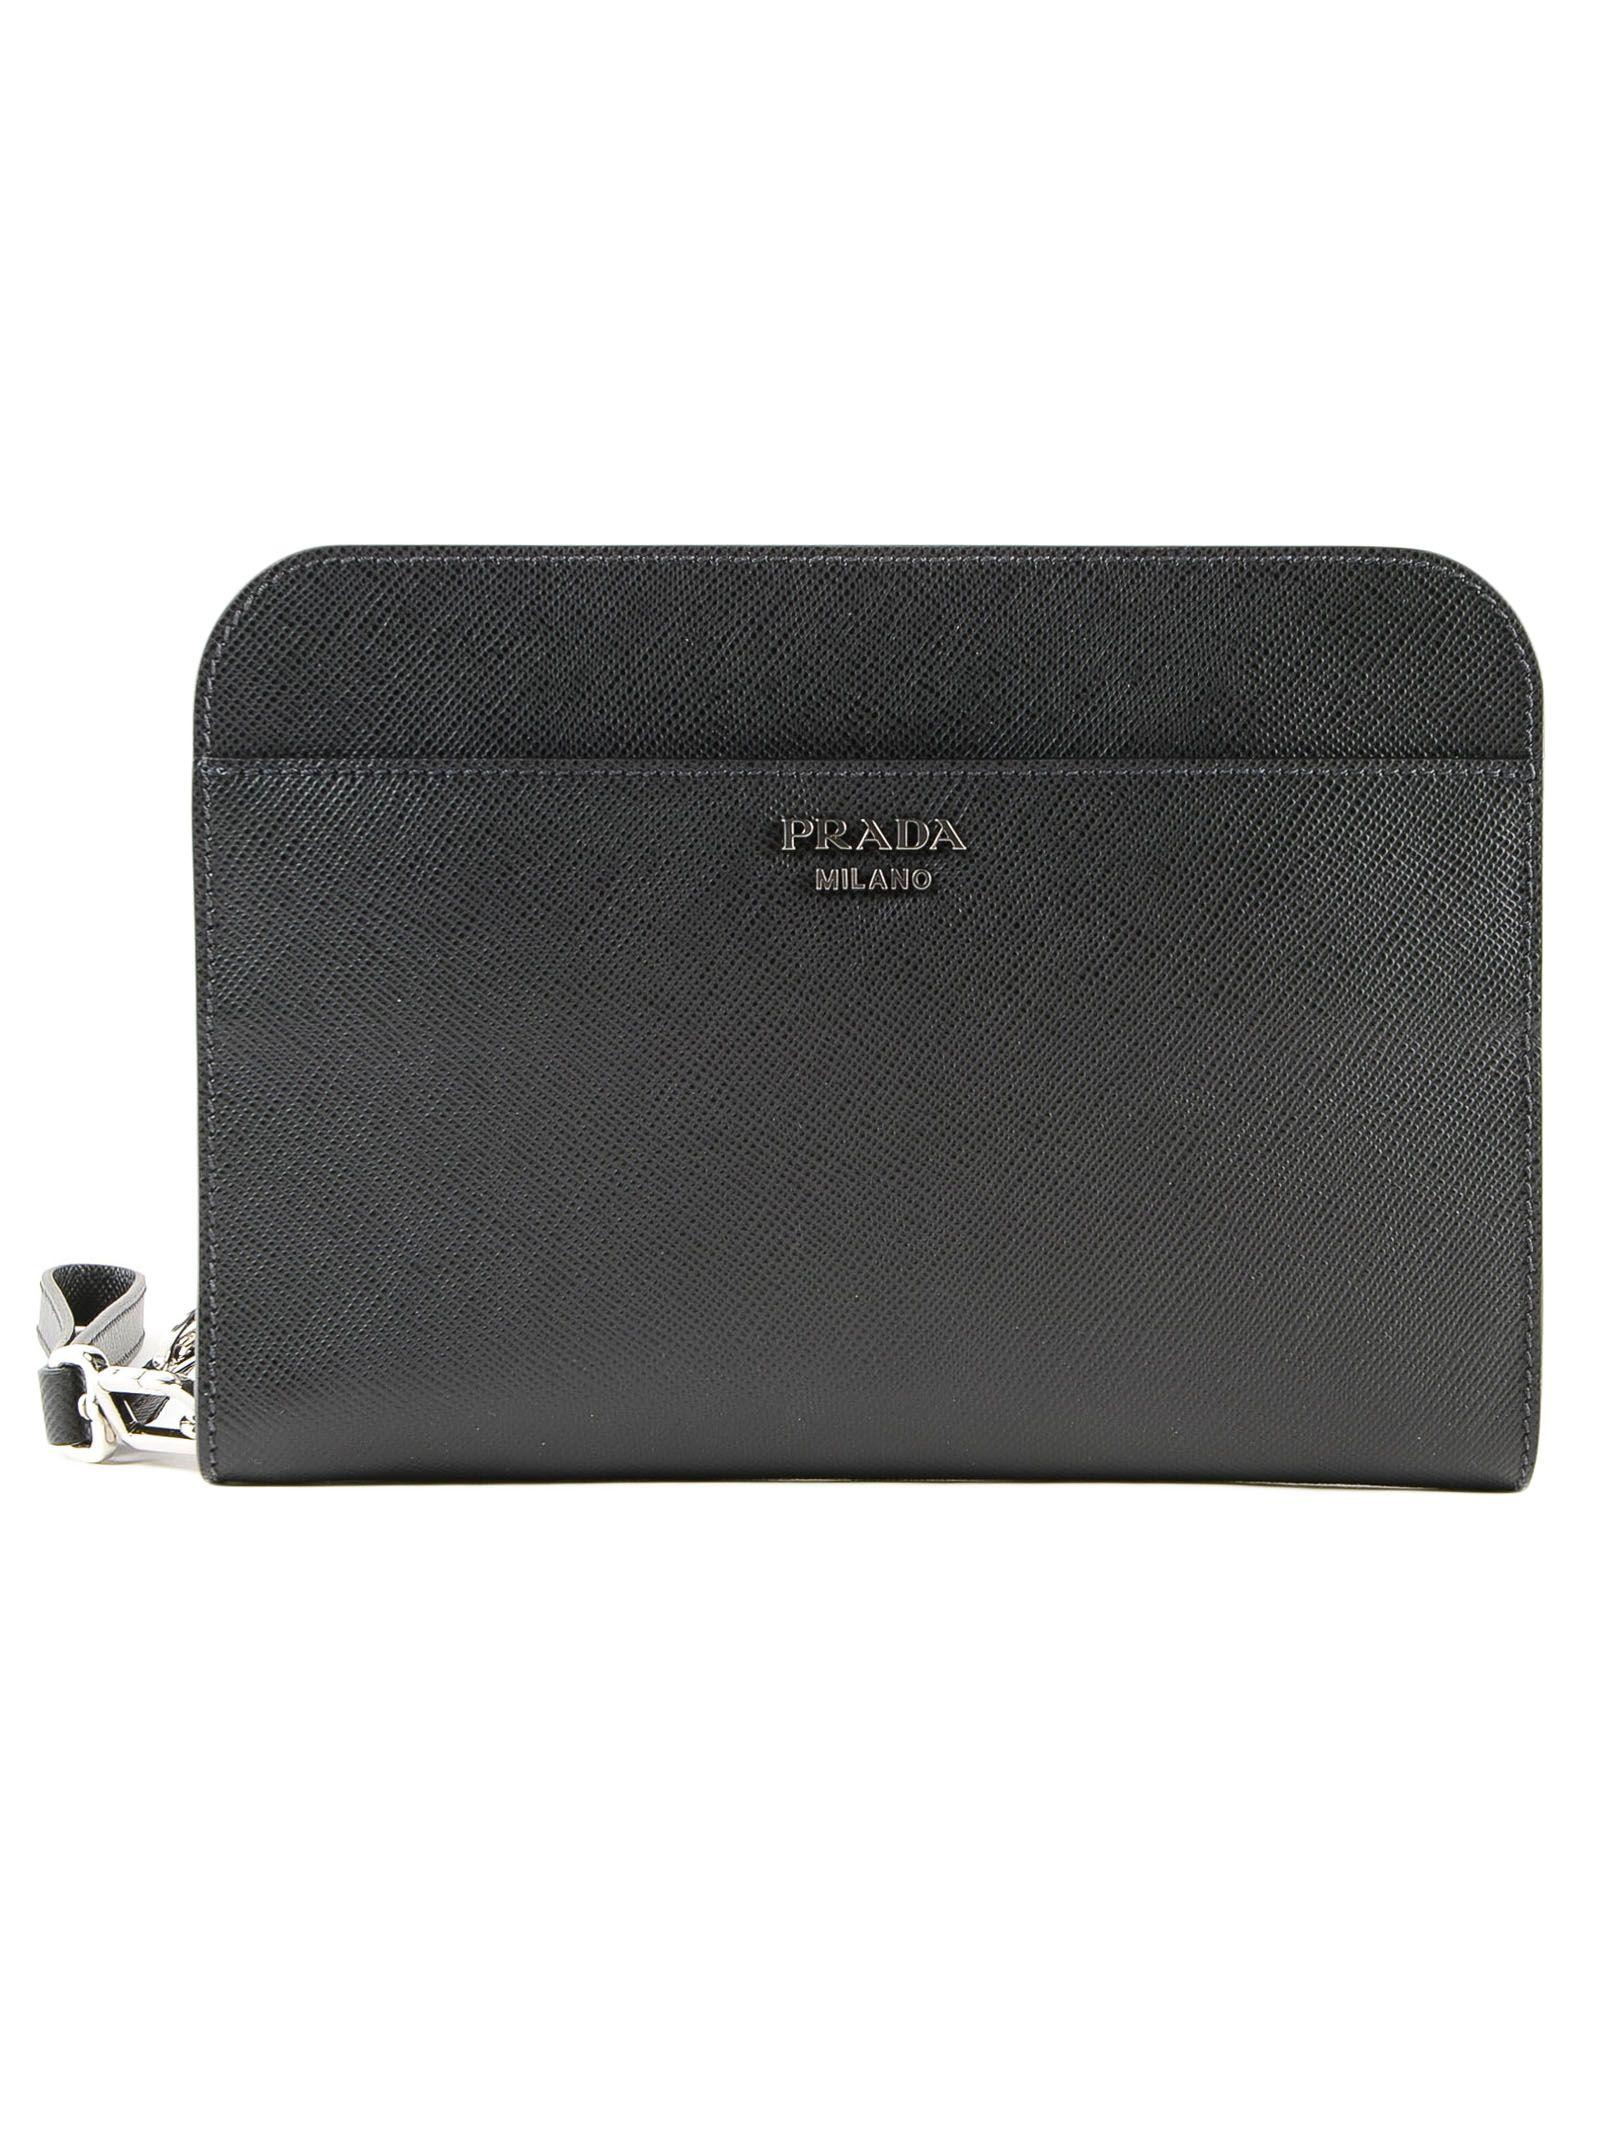 427781efbad1 Prada Prada Logo Clutch - Nero - 10773135   italist